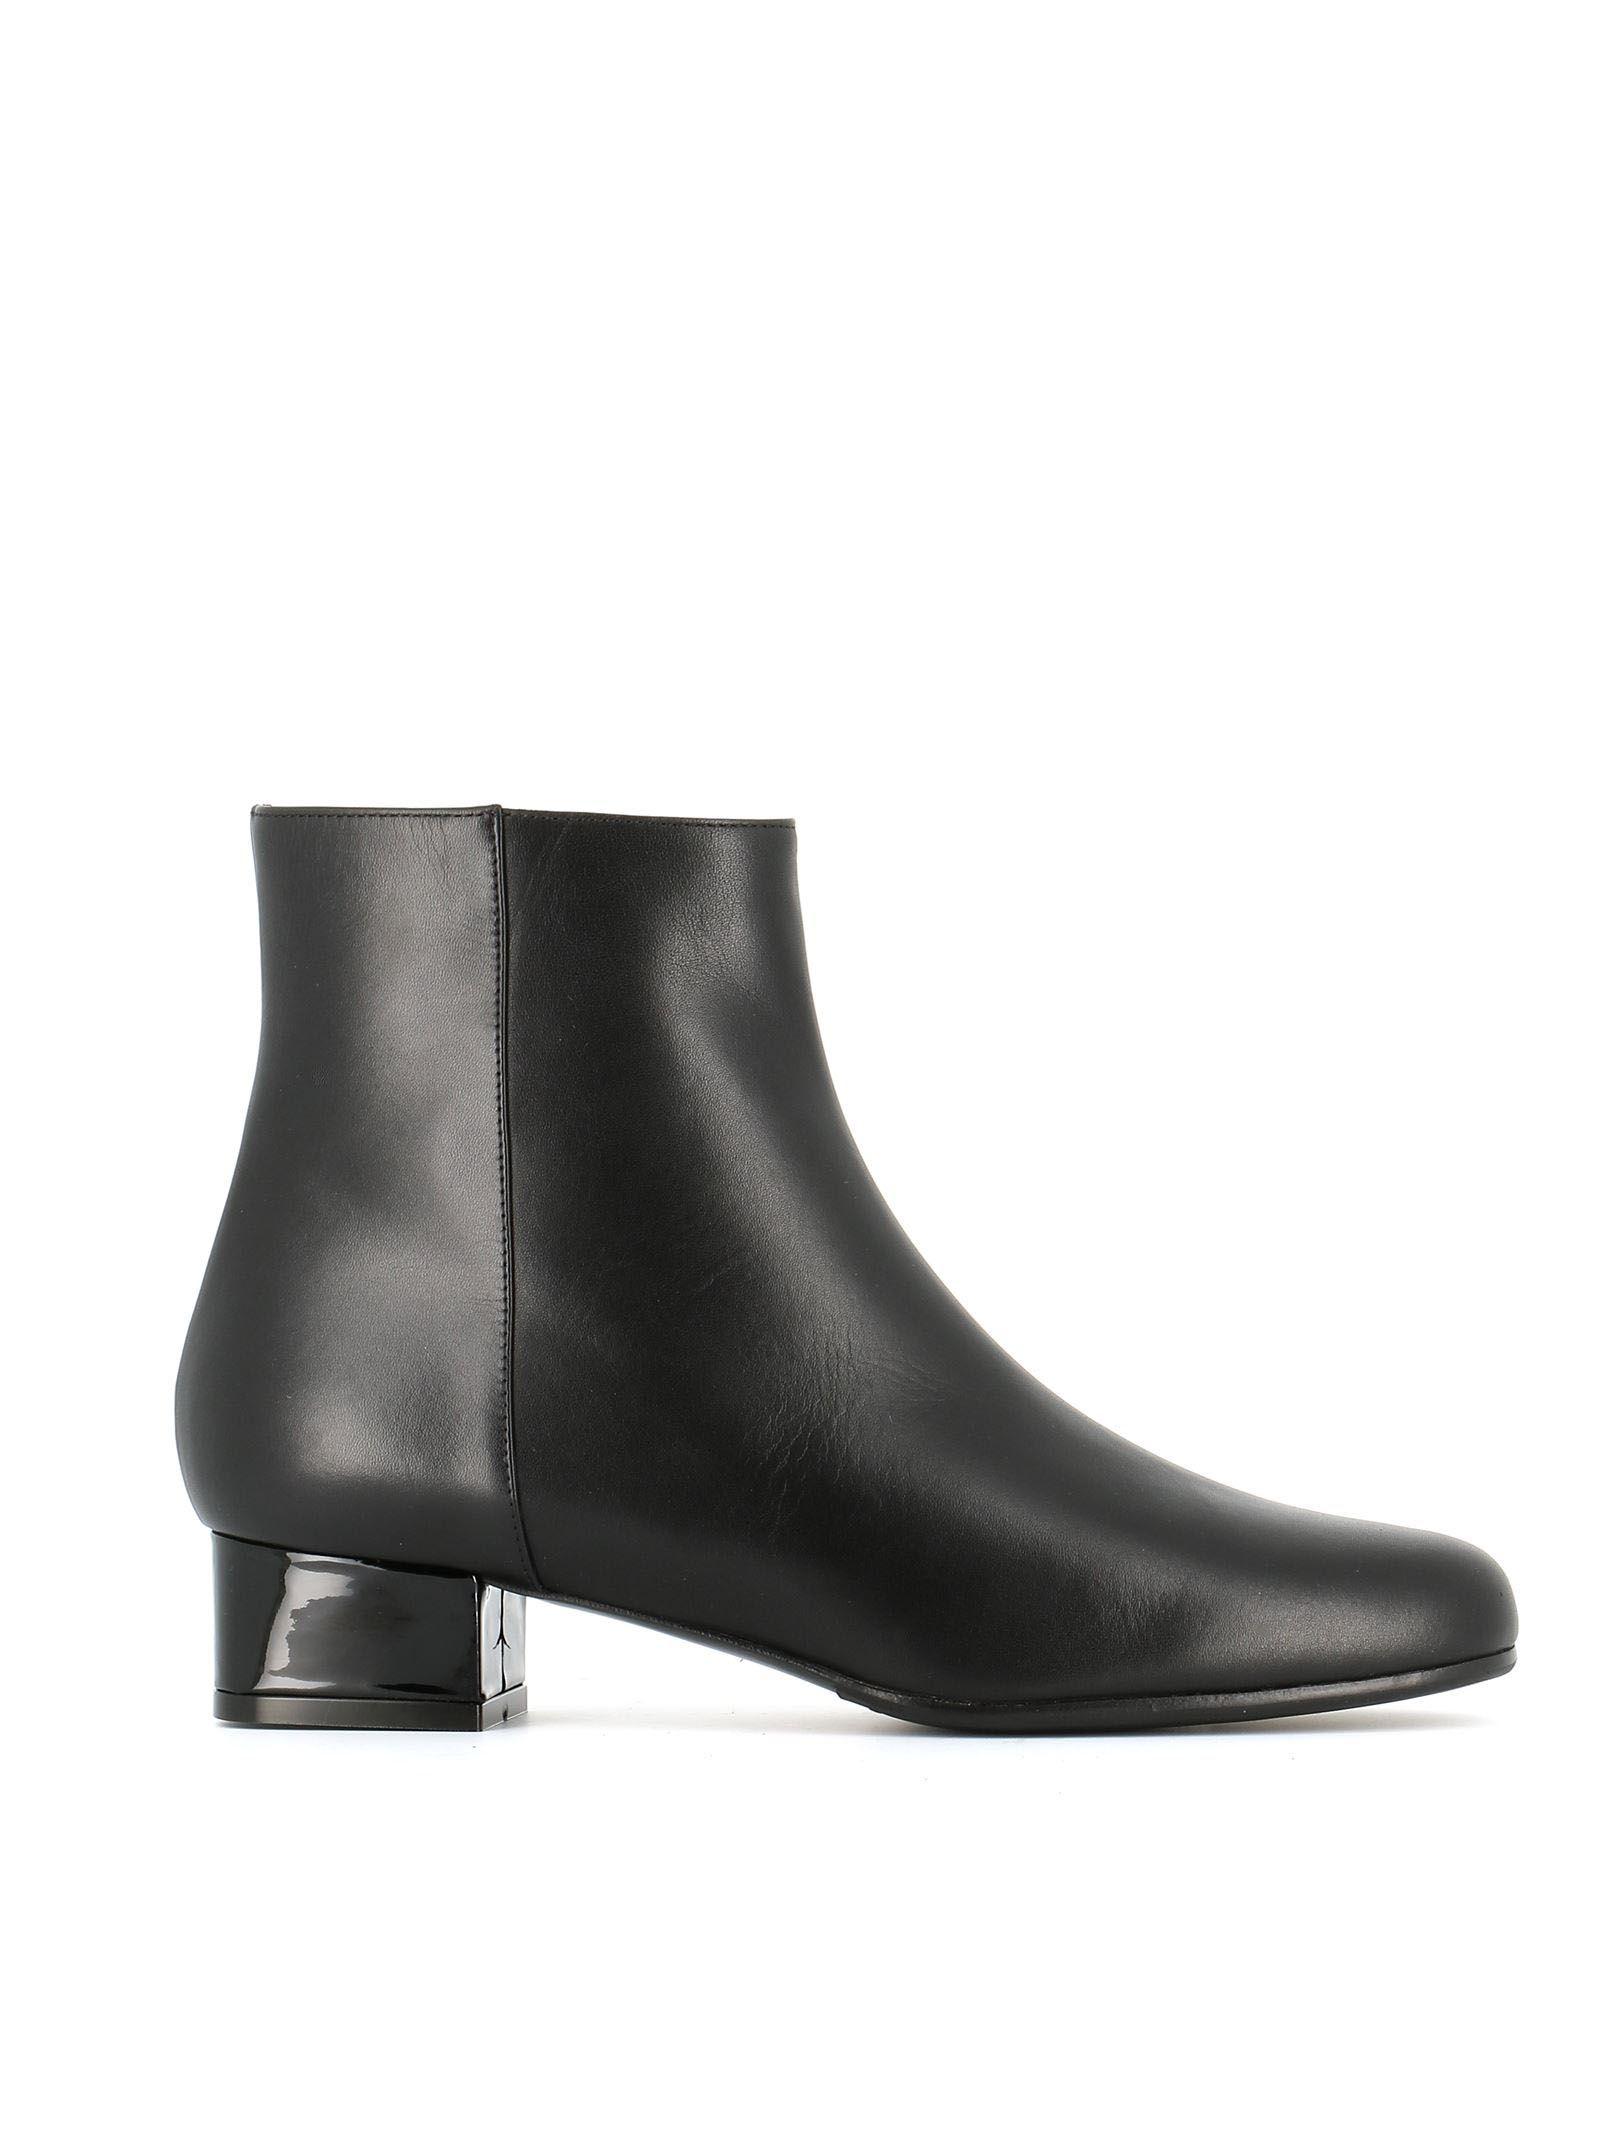 Antonio Barbato ab6403 Ankle Boots